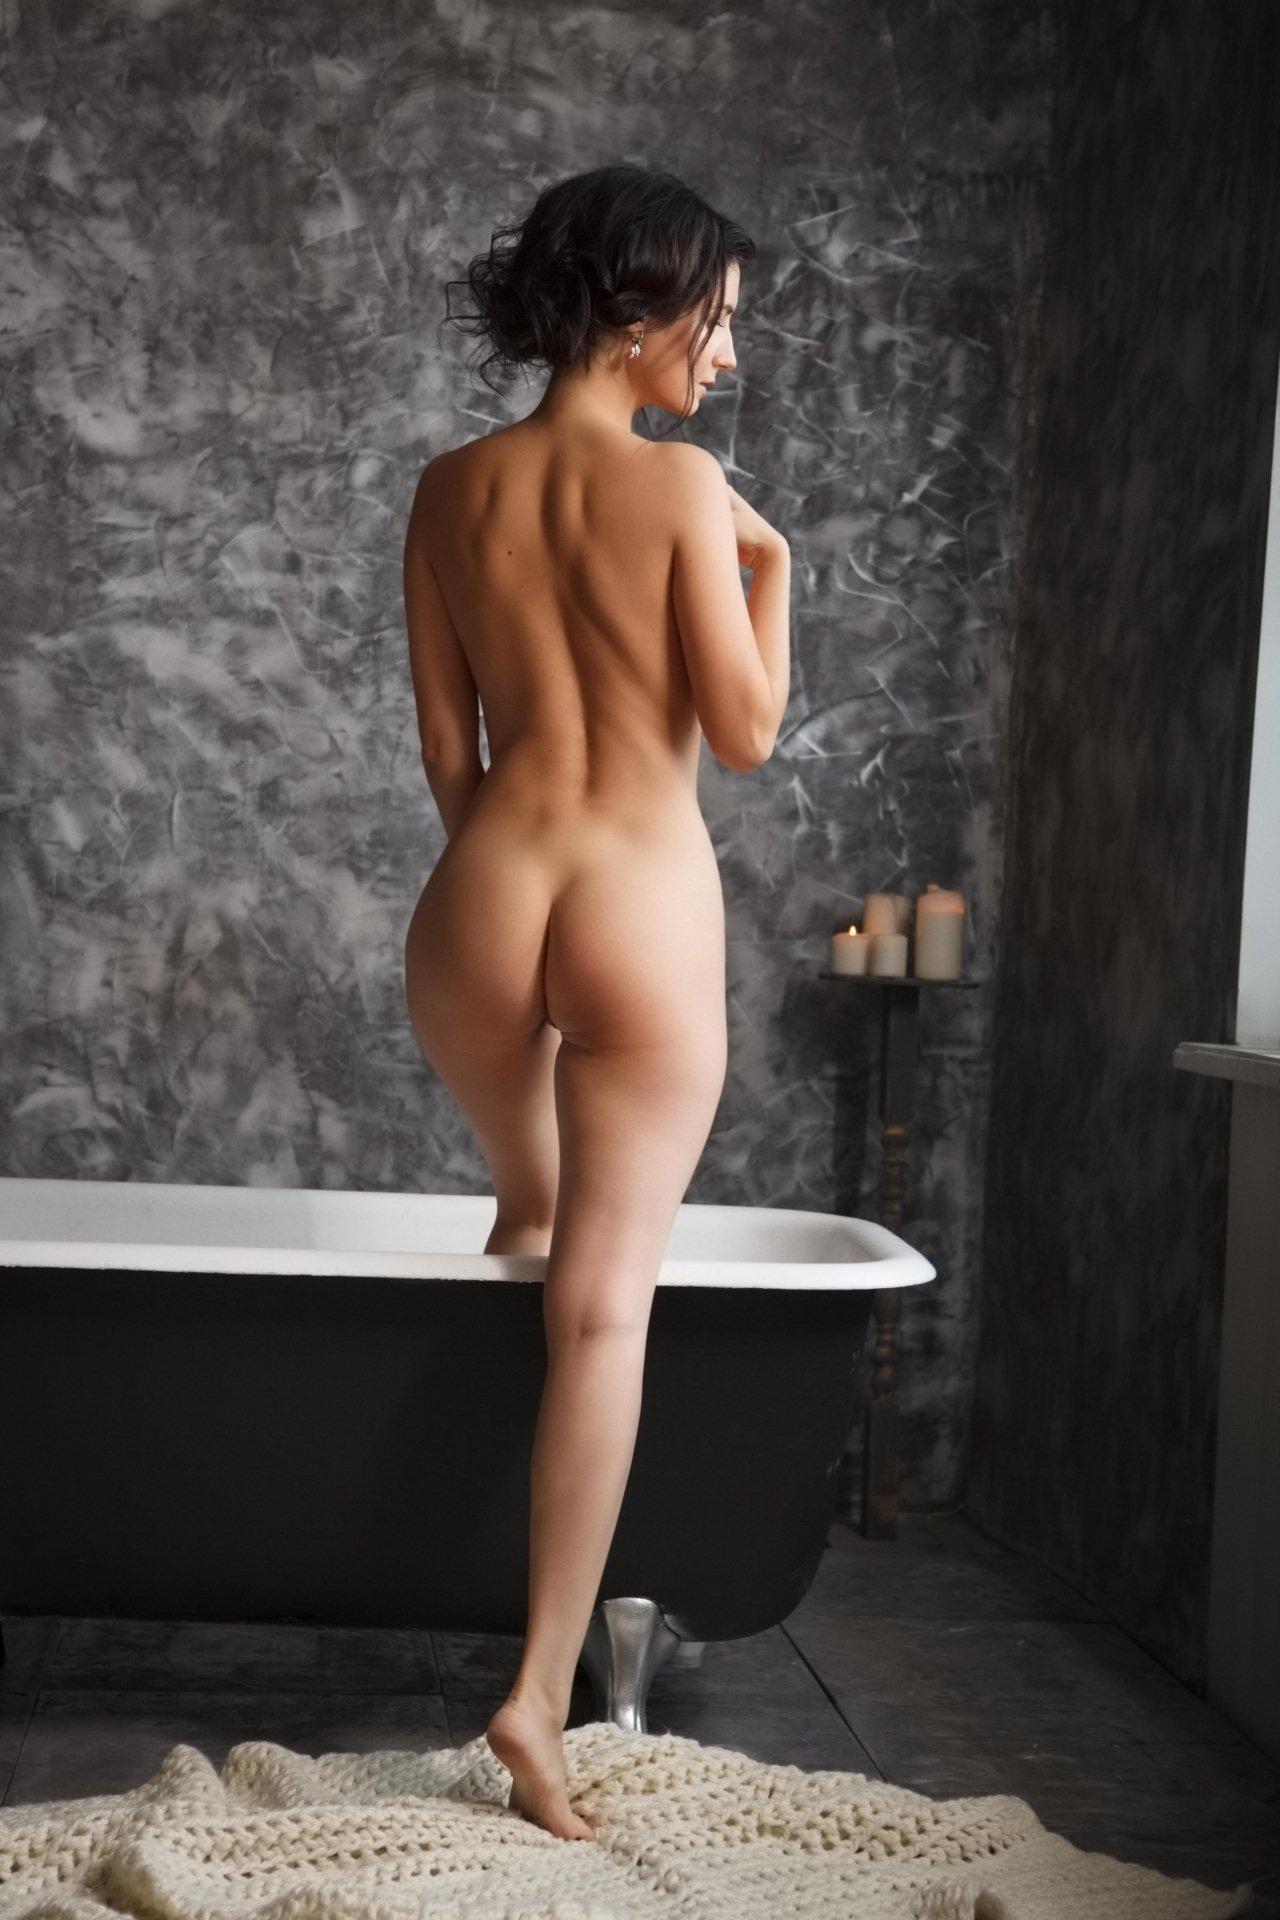 naked-girls-taking-bath-boobs-wet-mix-vol4-04